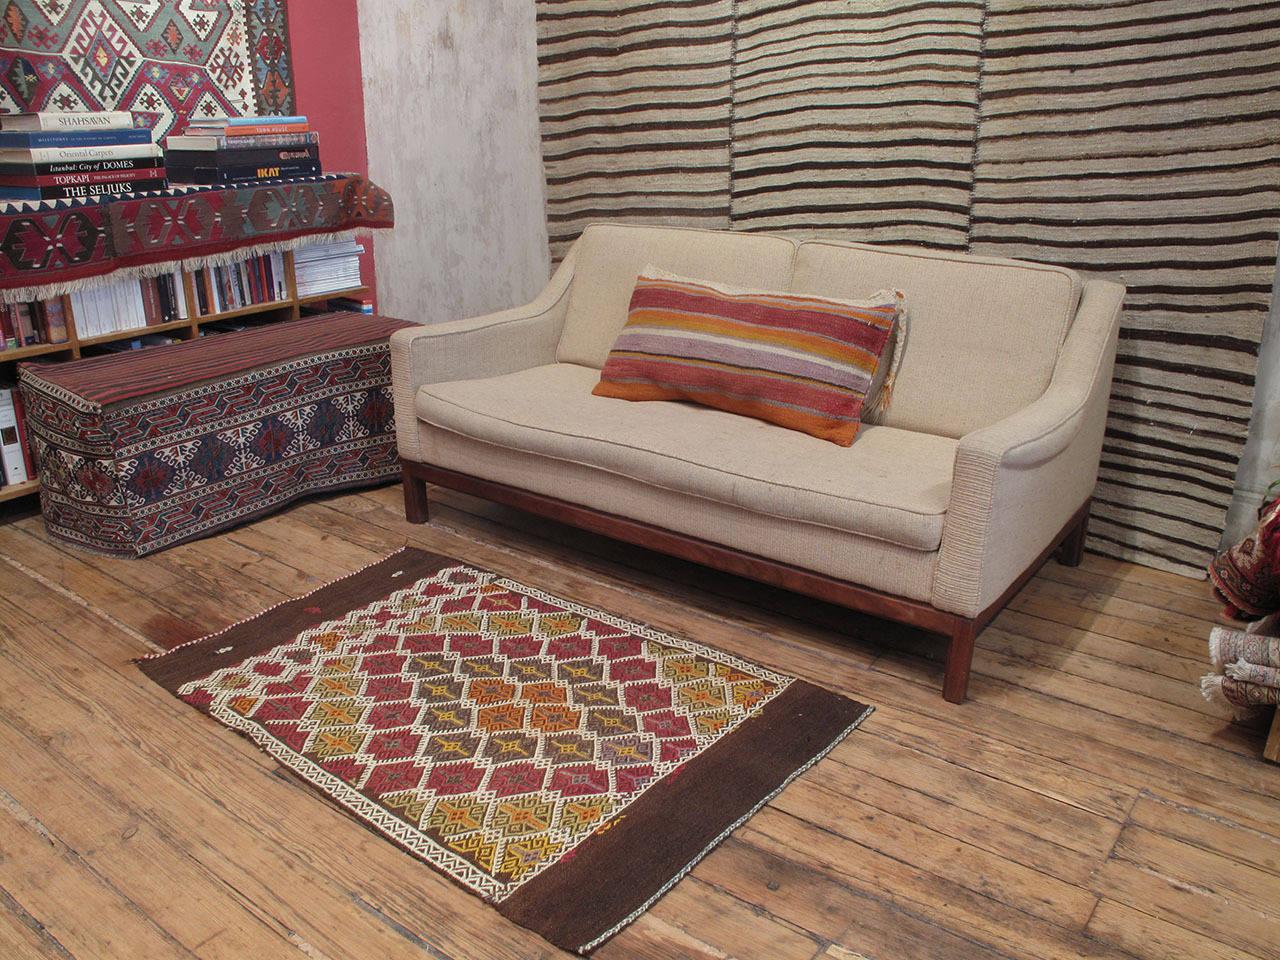 Tribal bag face small kilim image 2 for 14 wall street 20th floor new york new york 10005